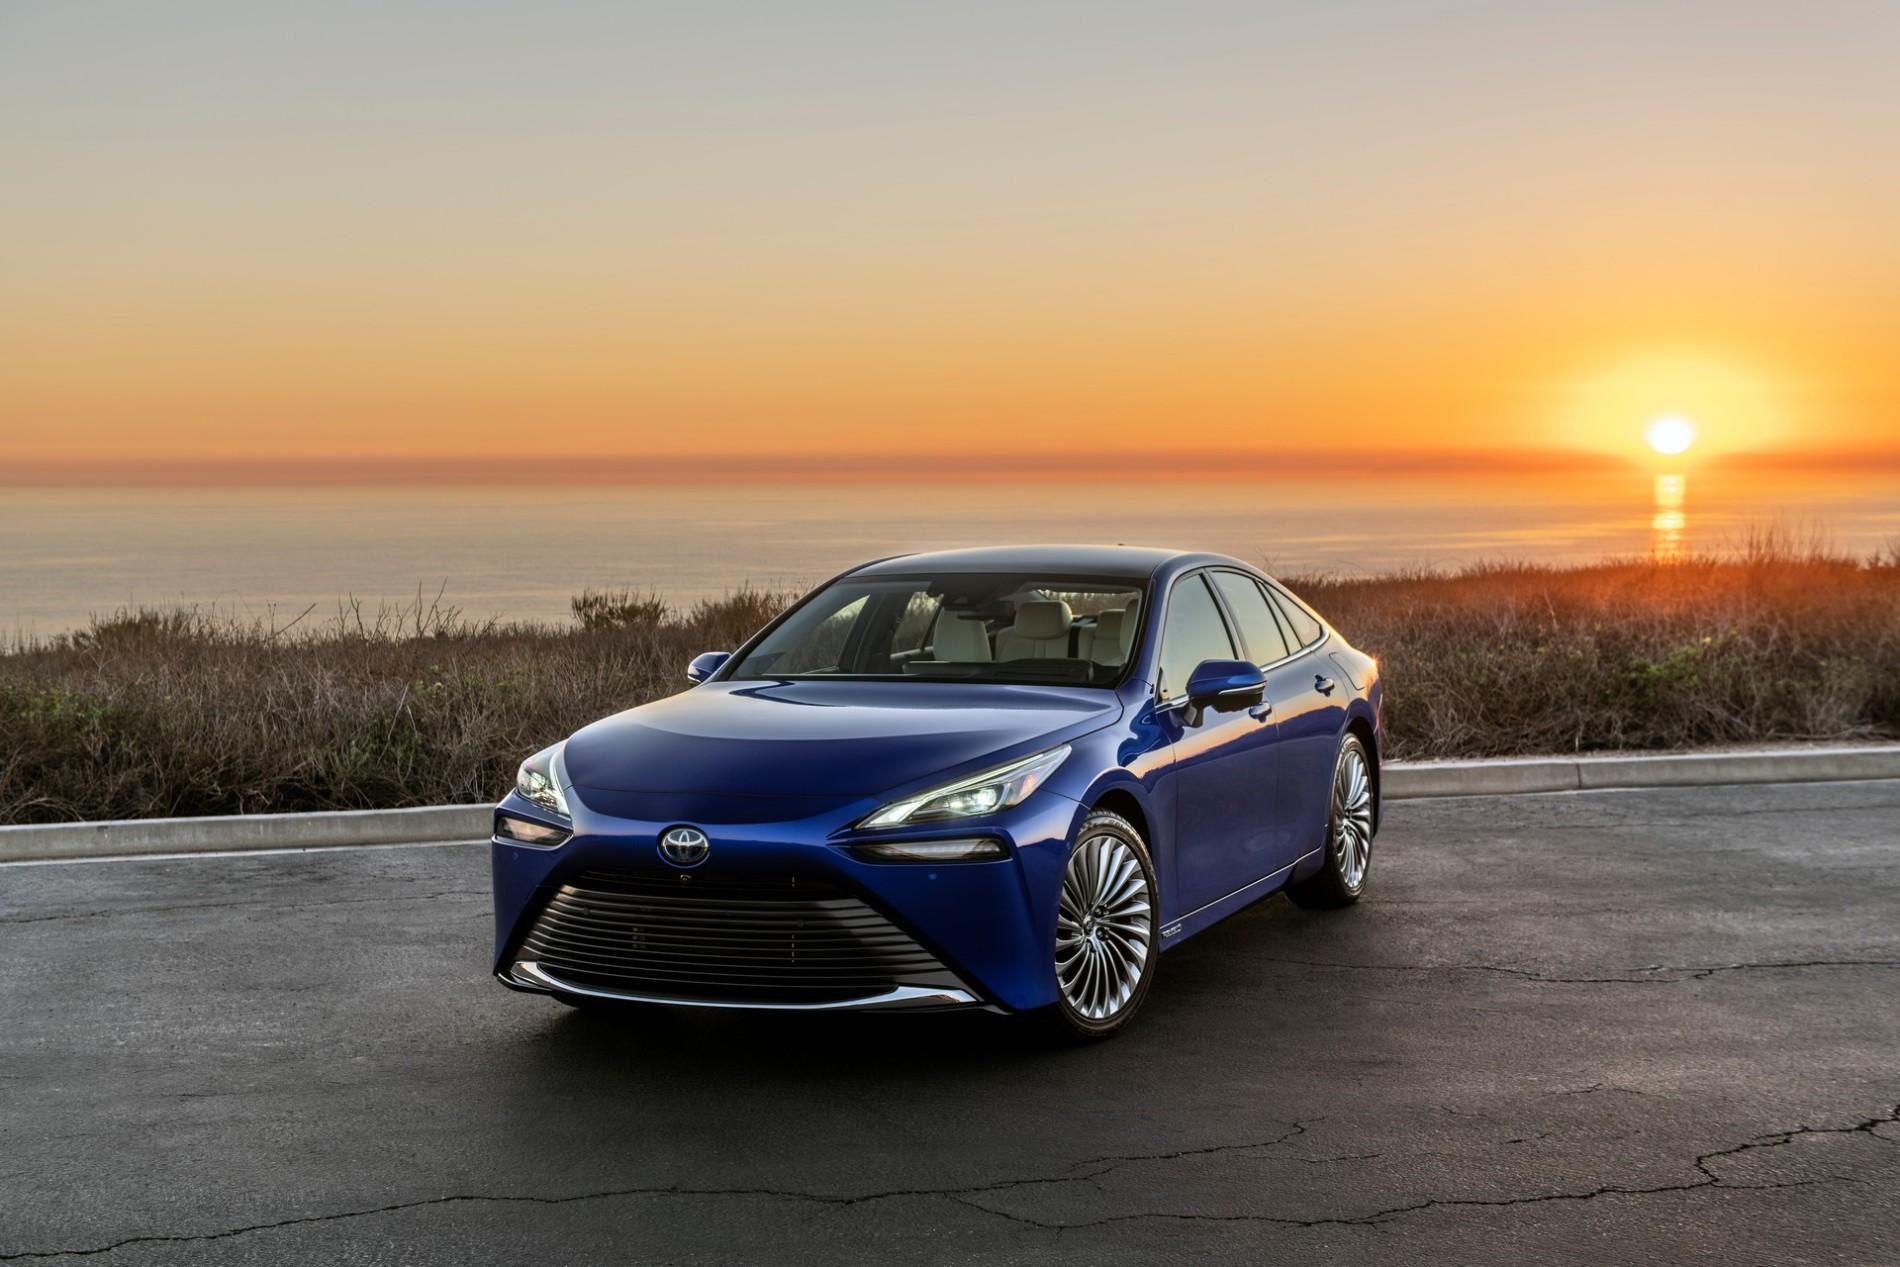 Toyota Mirai - Poze noi - Toyota Mirai - Poze noi